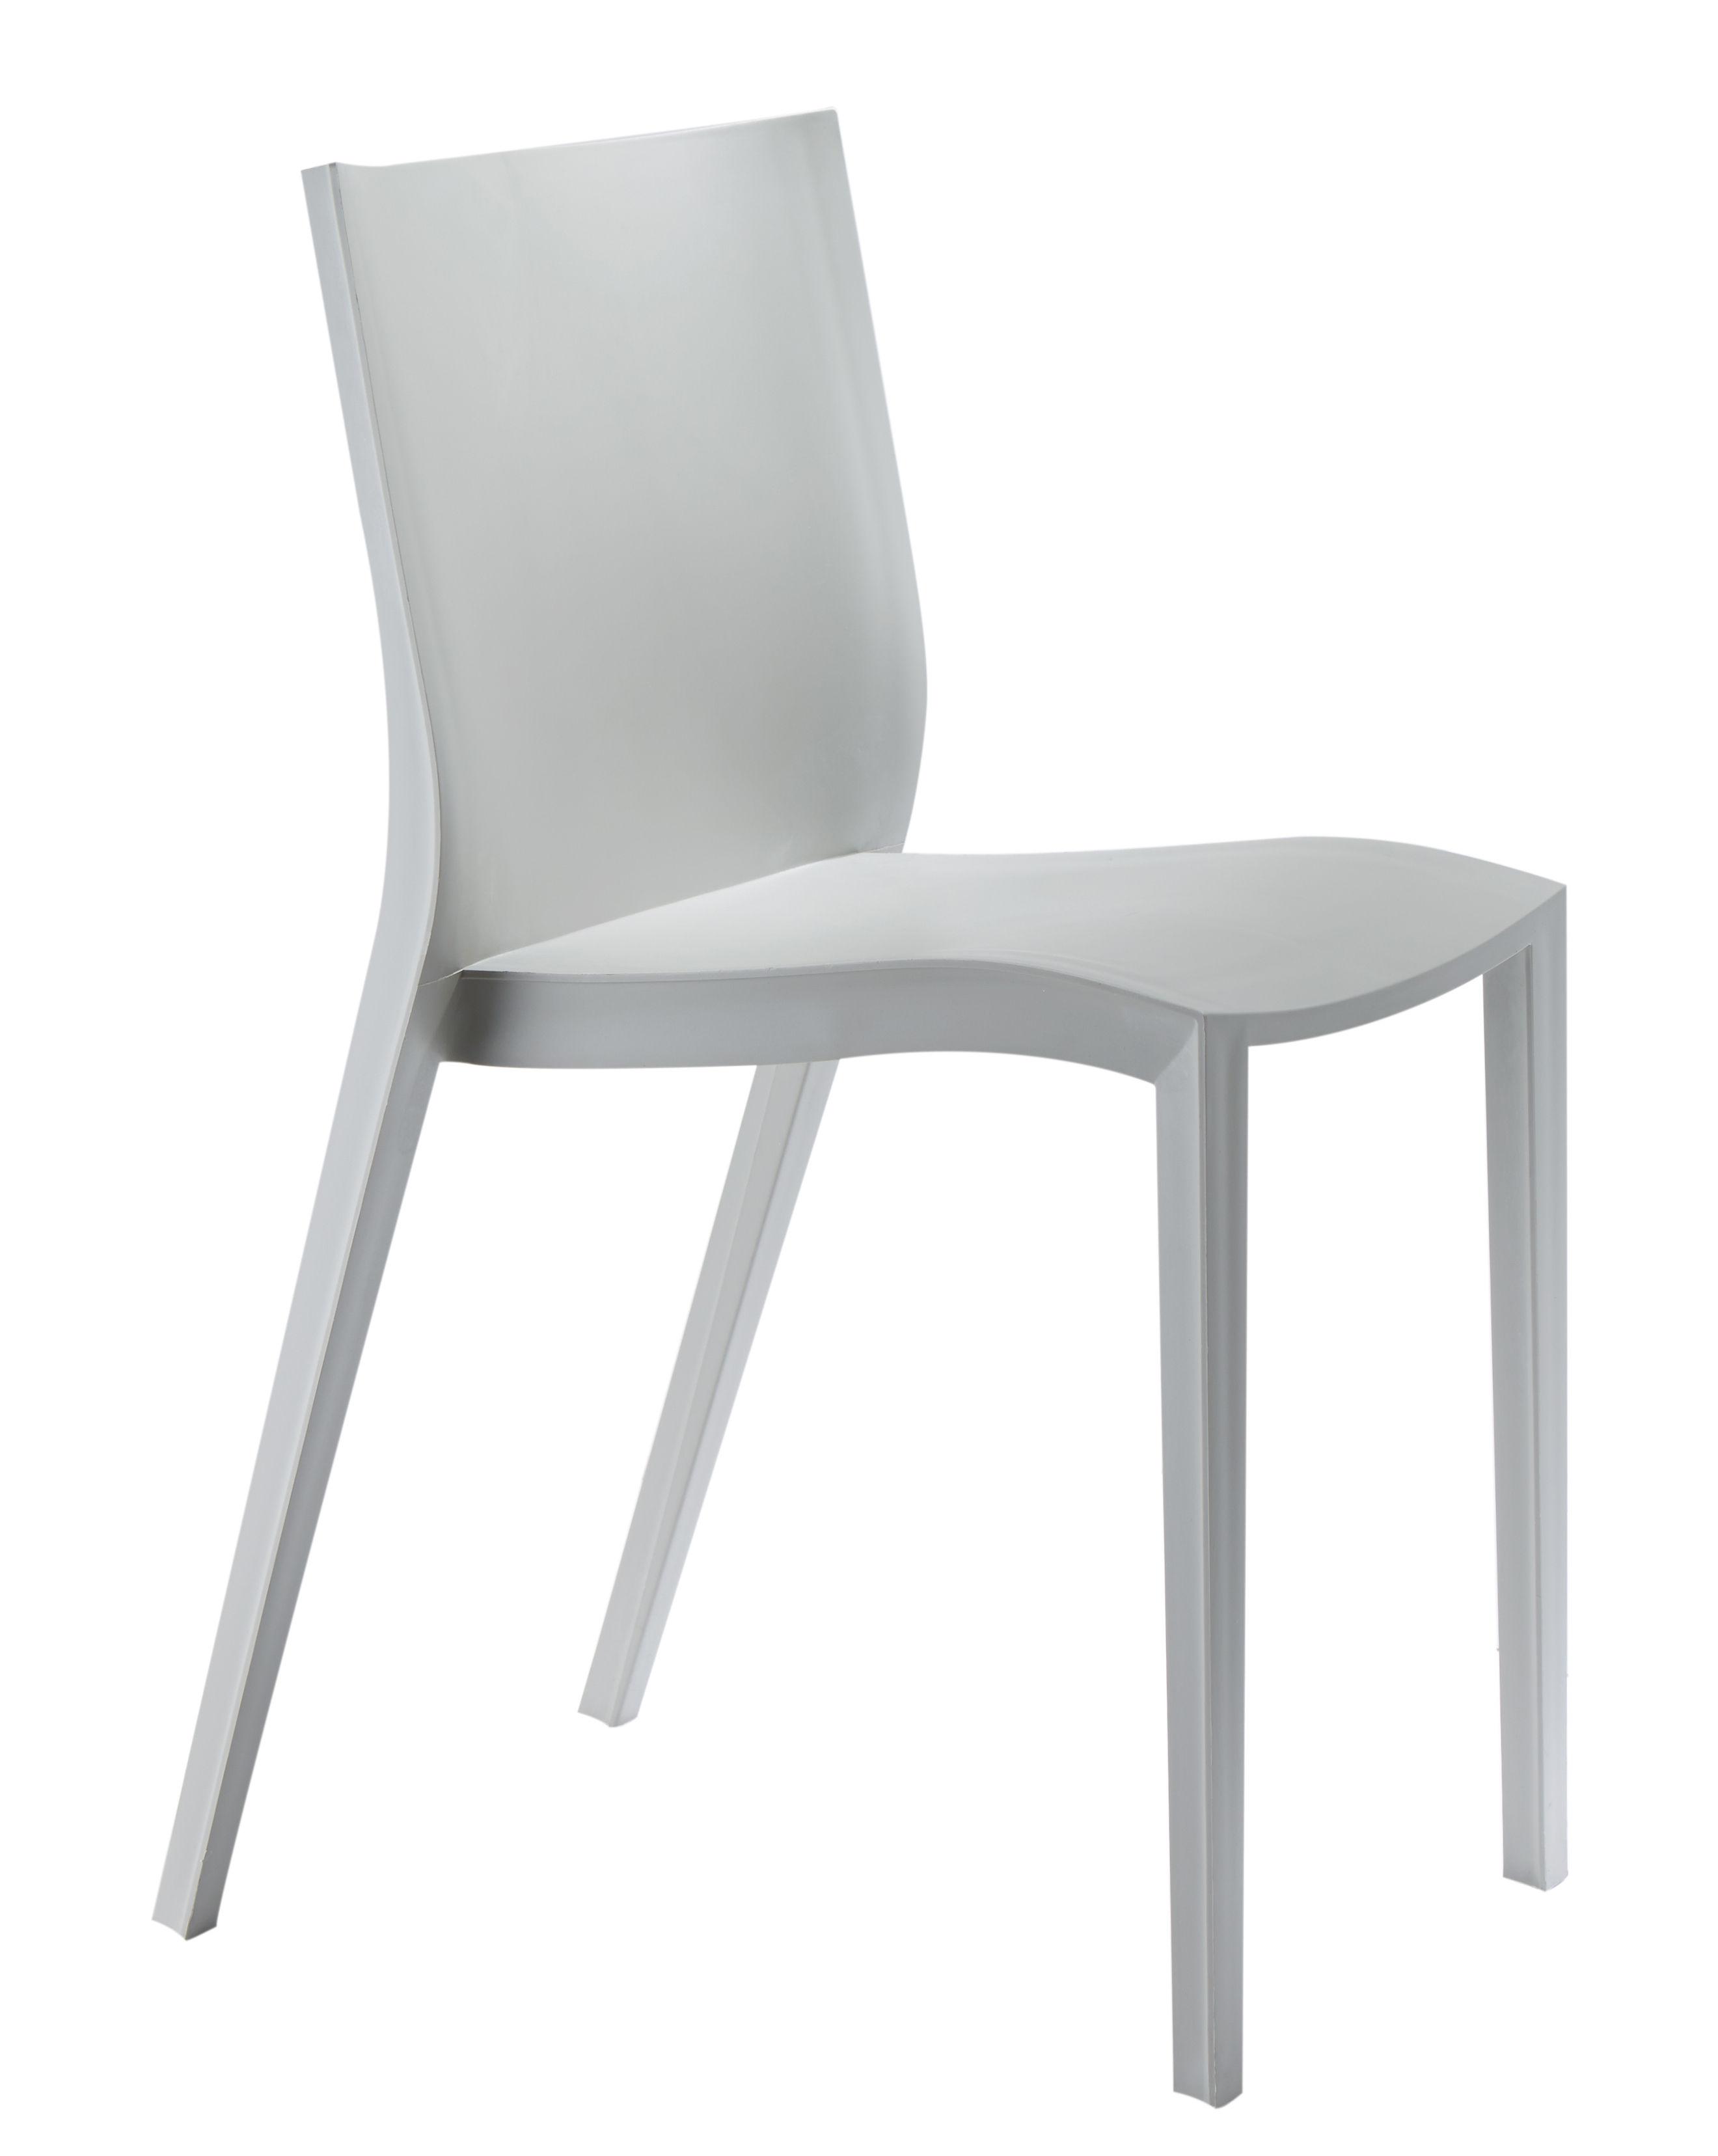 Charmant ... Möbel   Stühle   Slick Slick Stapelbarer Stuhl Von Philippe Starck   XO    Grau